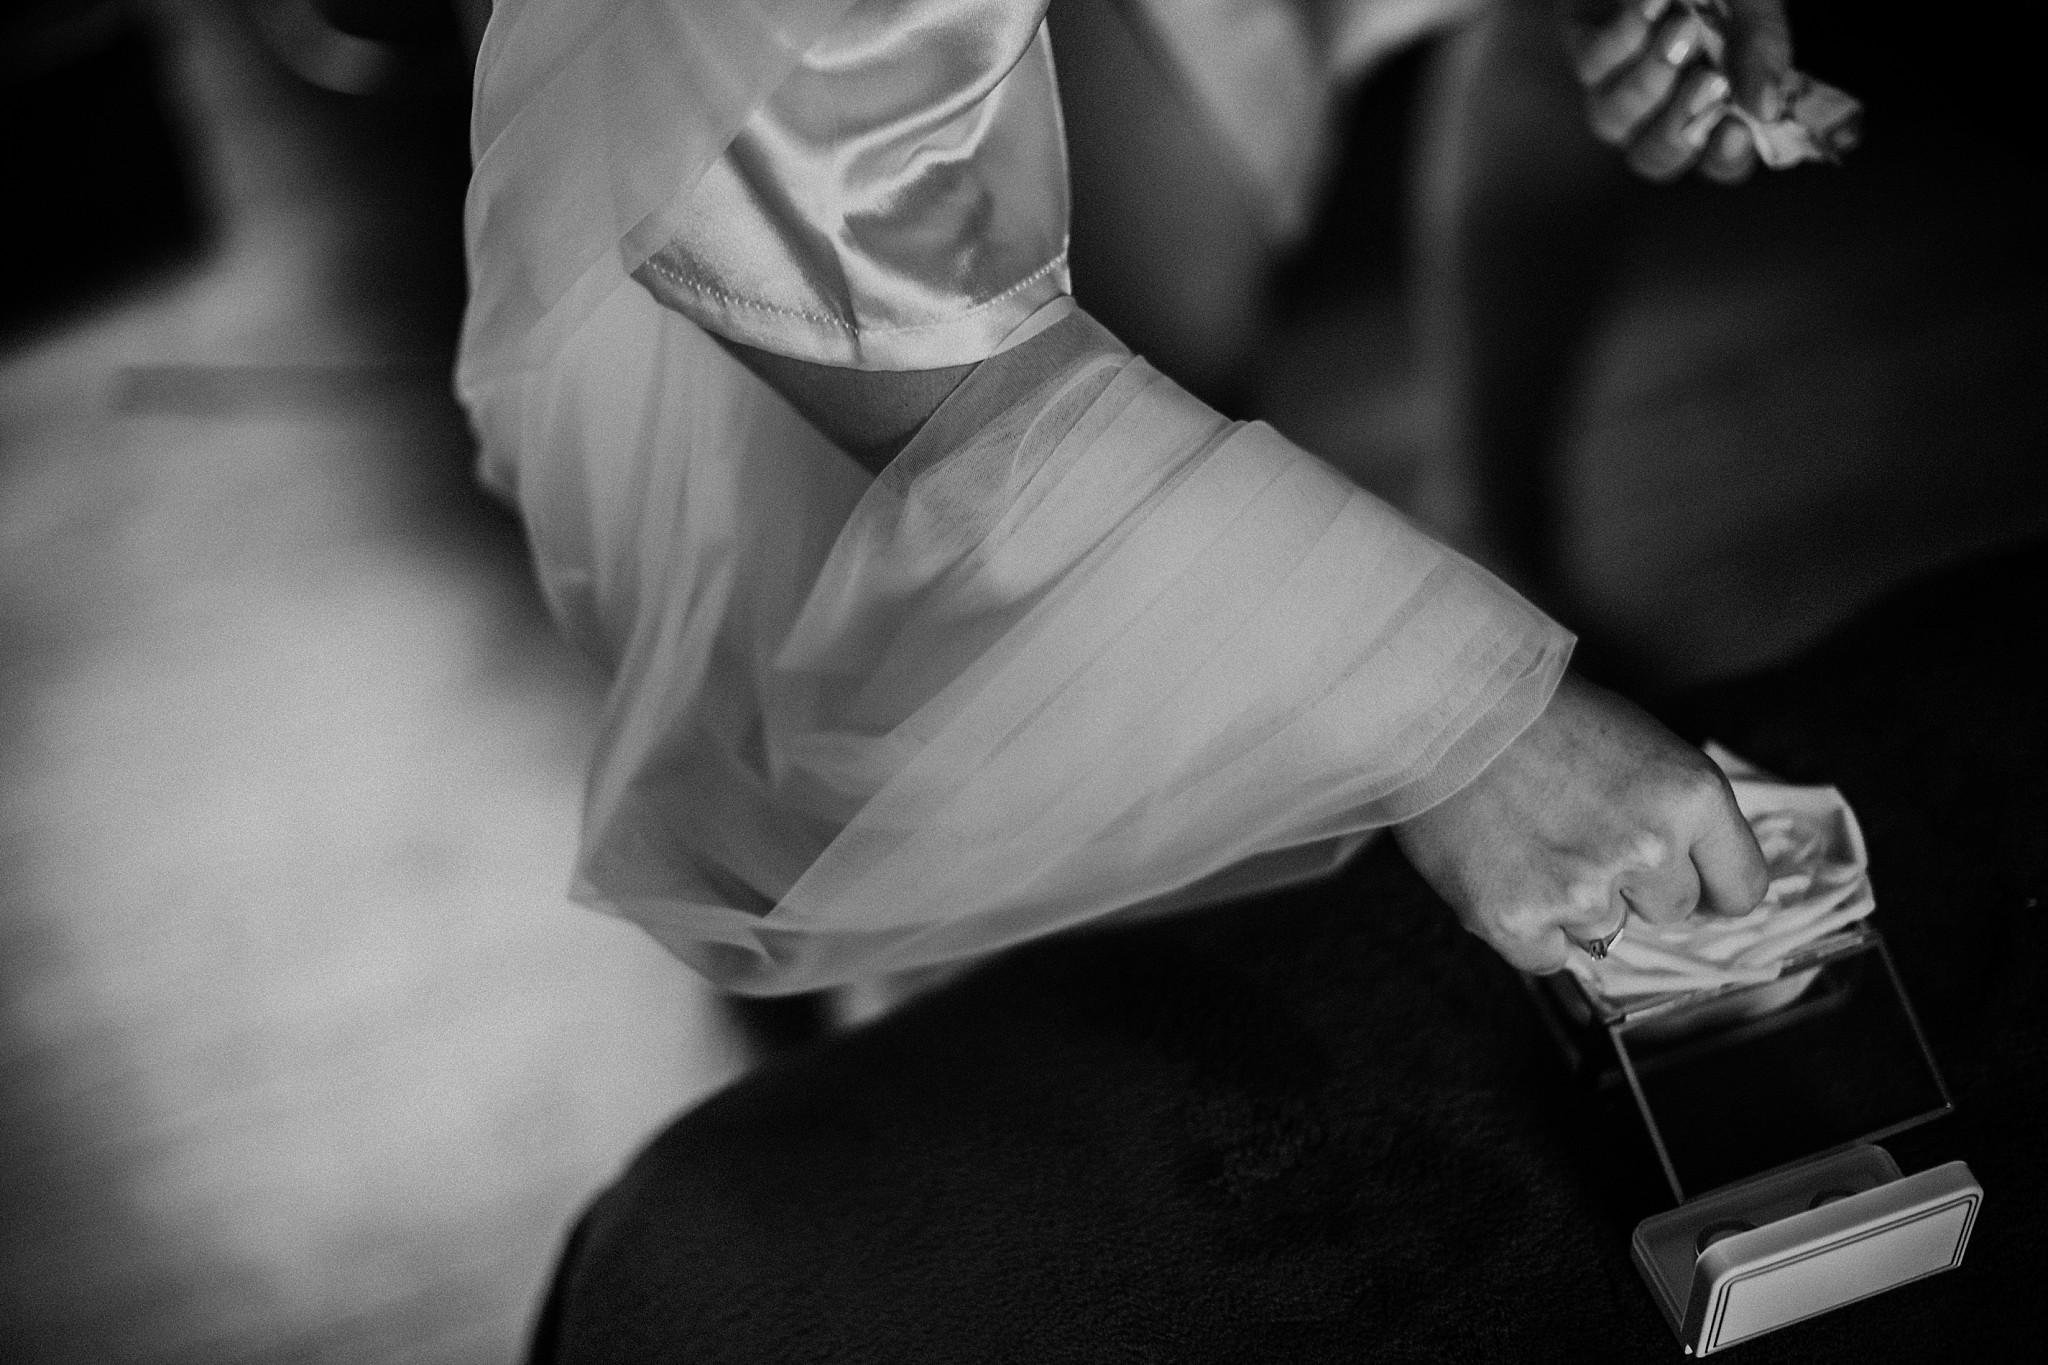 fotograf poznan wesele dobra truskawka piekne wesele pod poznaniem wesele w dobrej truskawce piekna para mloda slub marzen slub koronawirus slub listopad wesele koronawirus 028